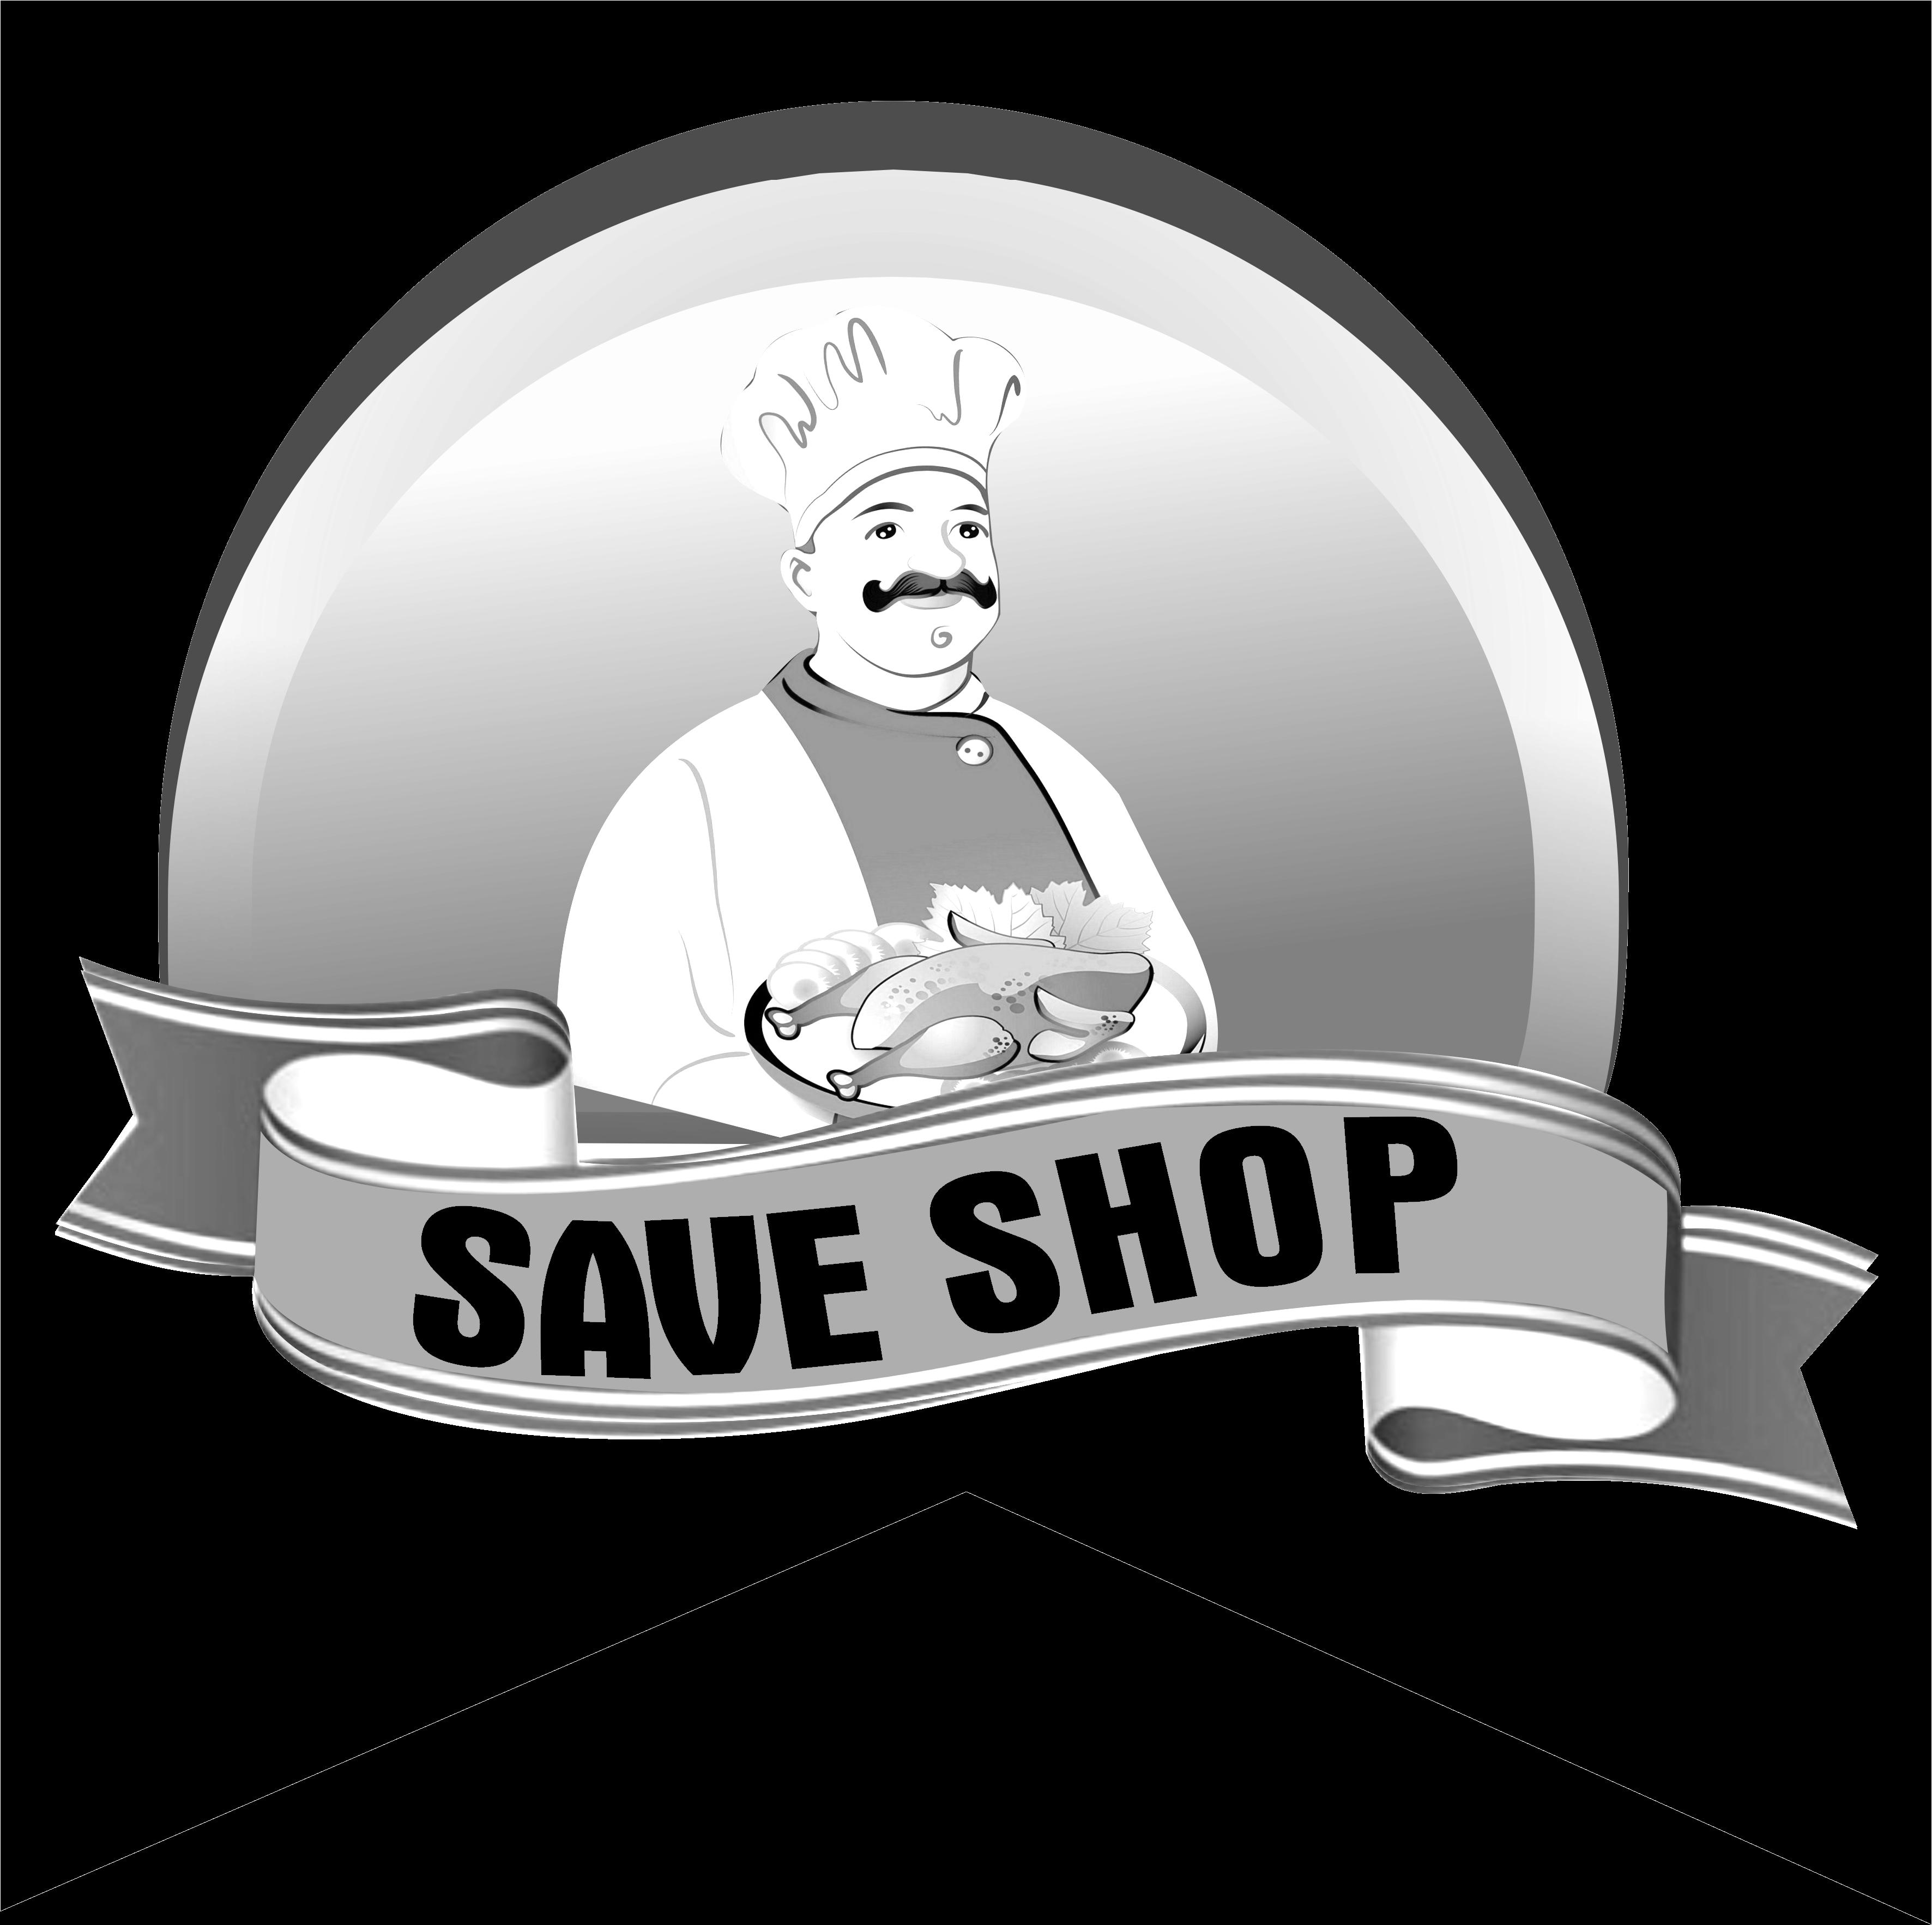 Saveshop S2